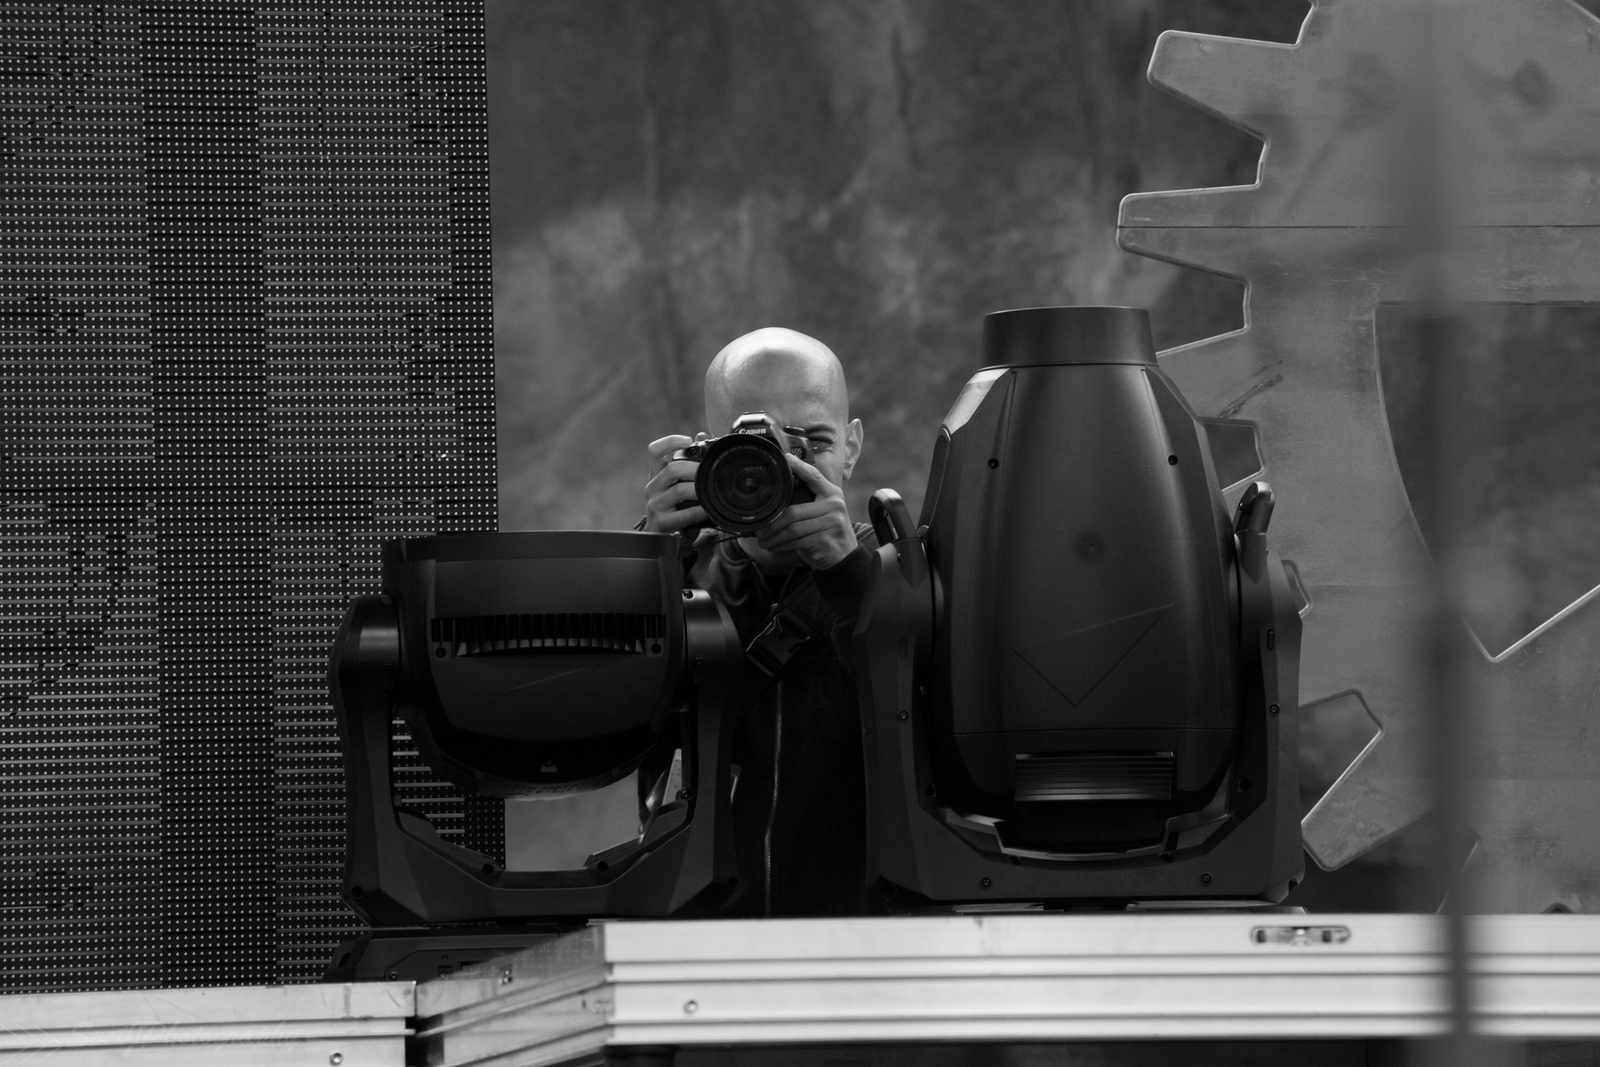 Adam Elmakias Photographing Melanie Martinez Live at Red Rocks Amphitheater - photo bySvetlana Joukova